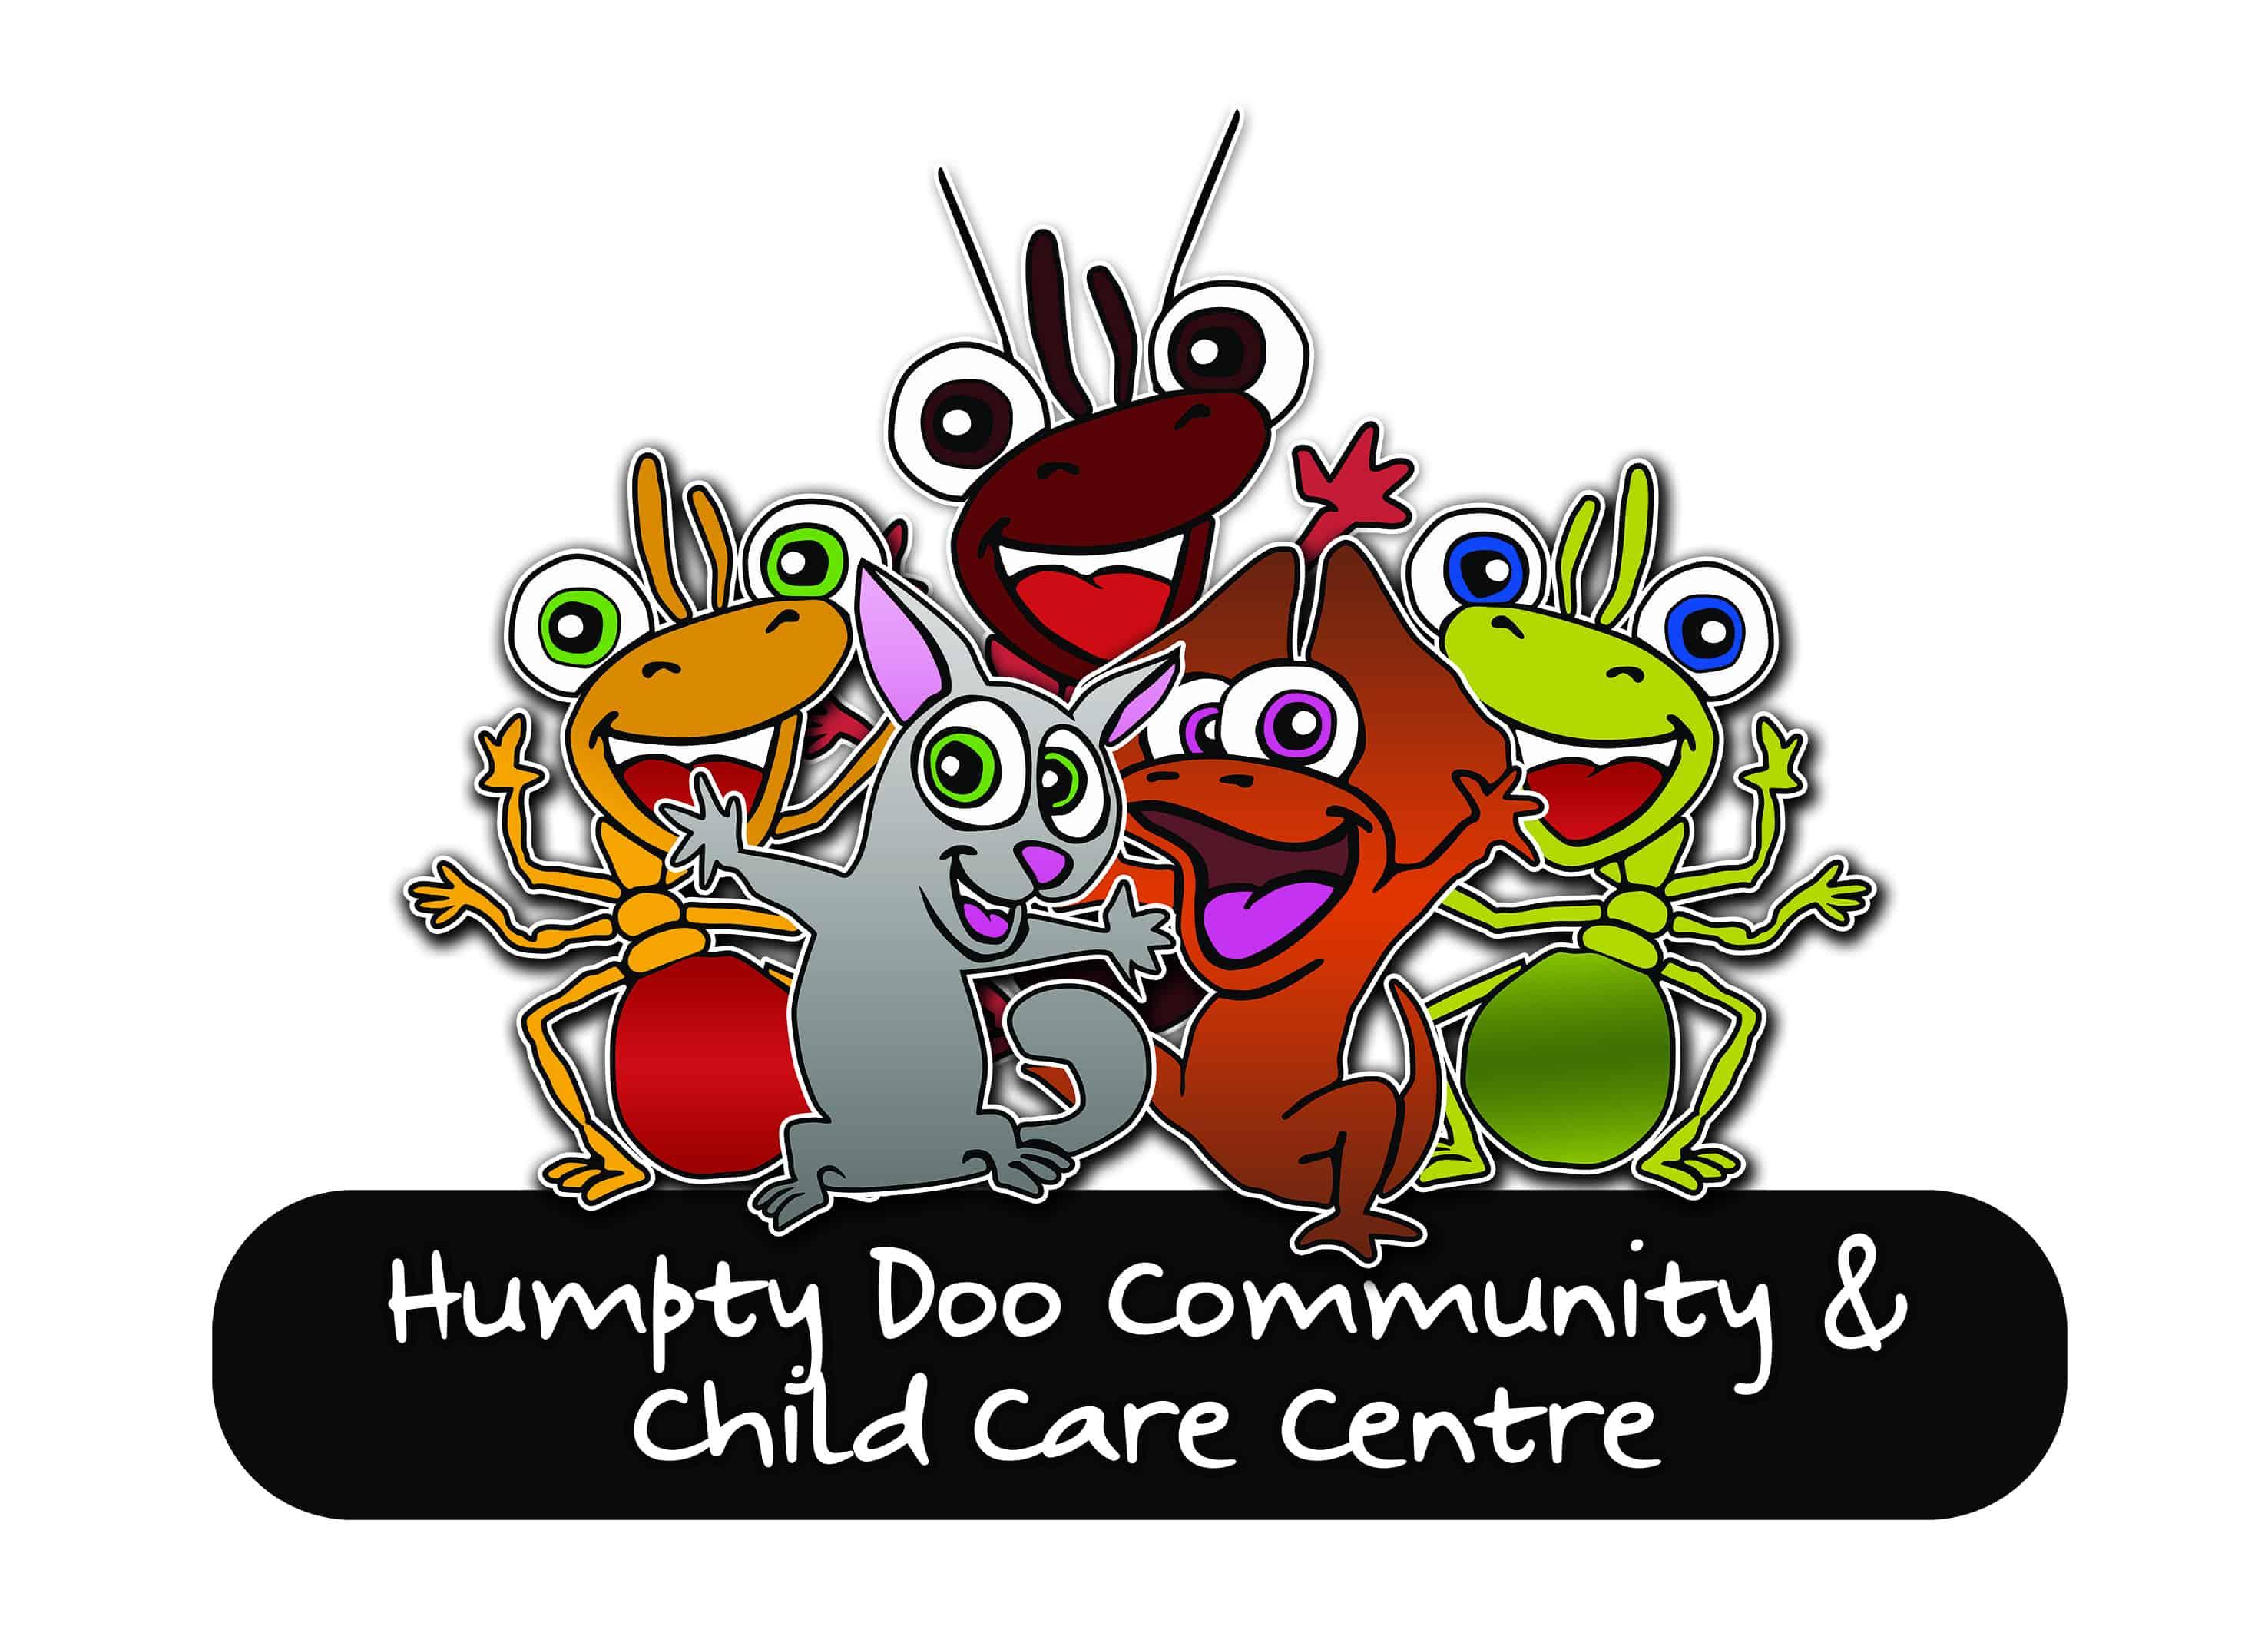 Humpty Doo Community & Child Care Centre